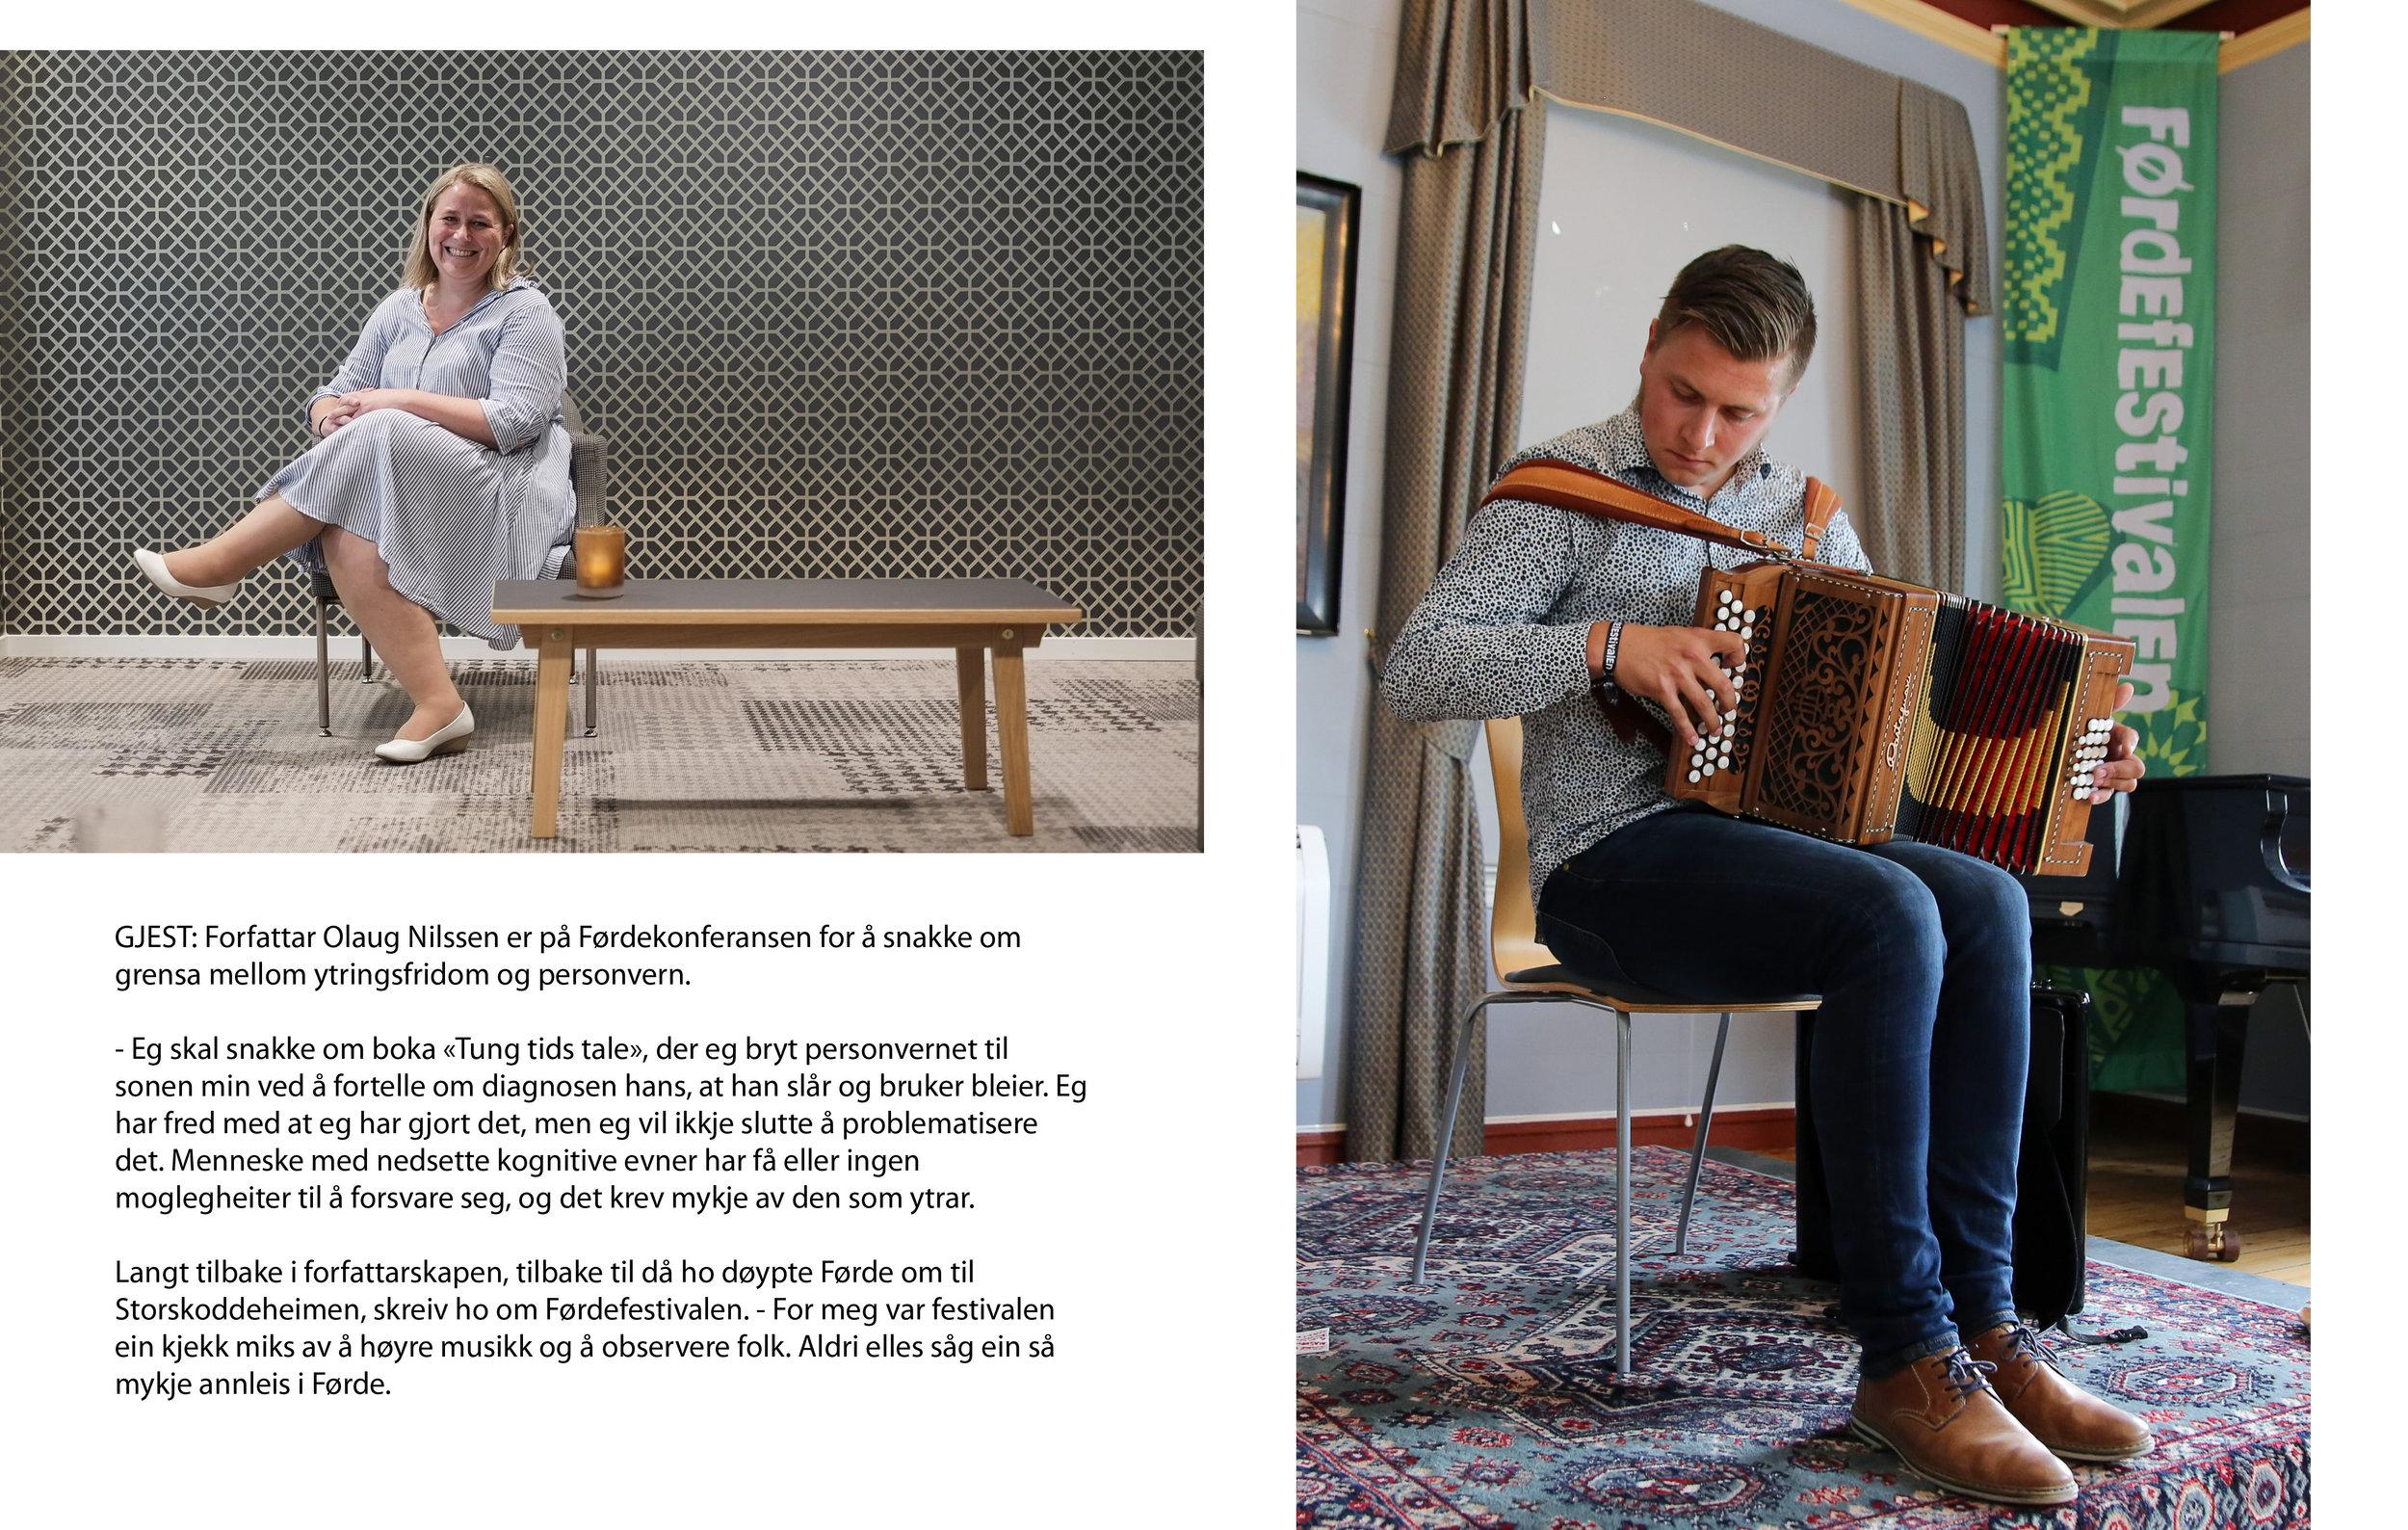 FordefestivalMagazineForWeb Page 60.jpg